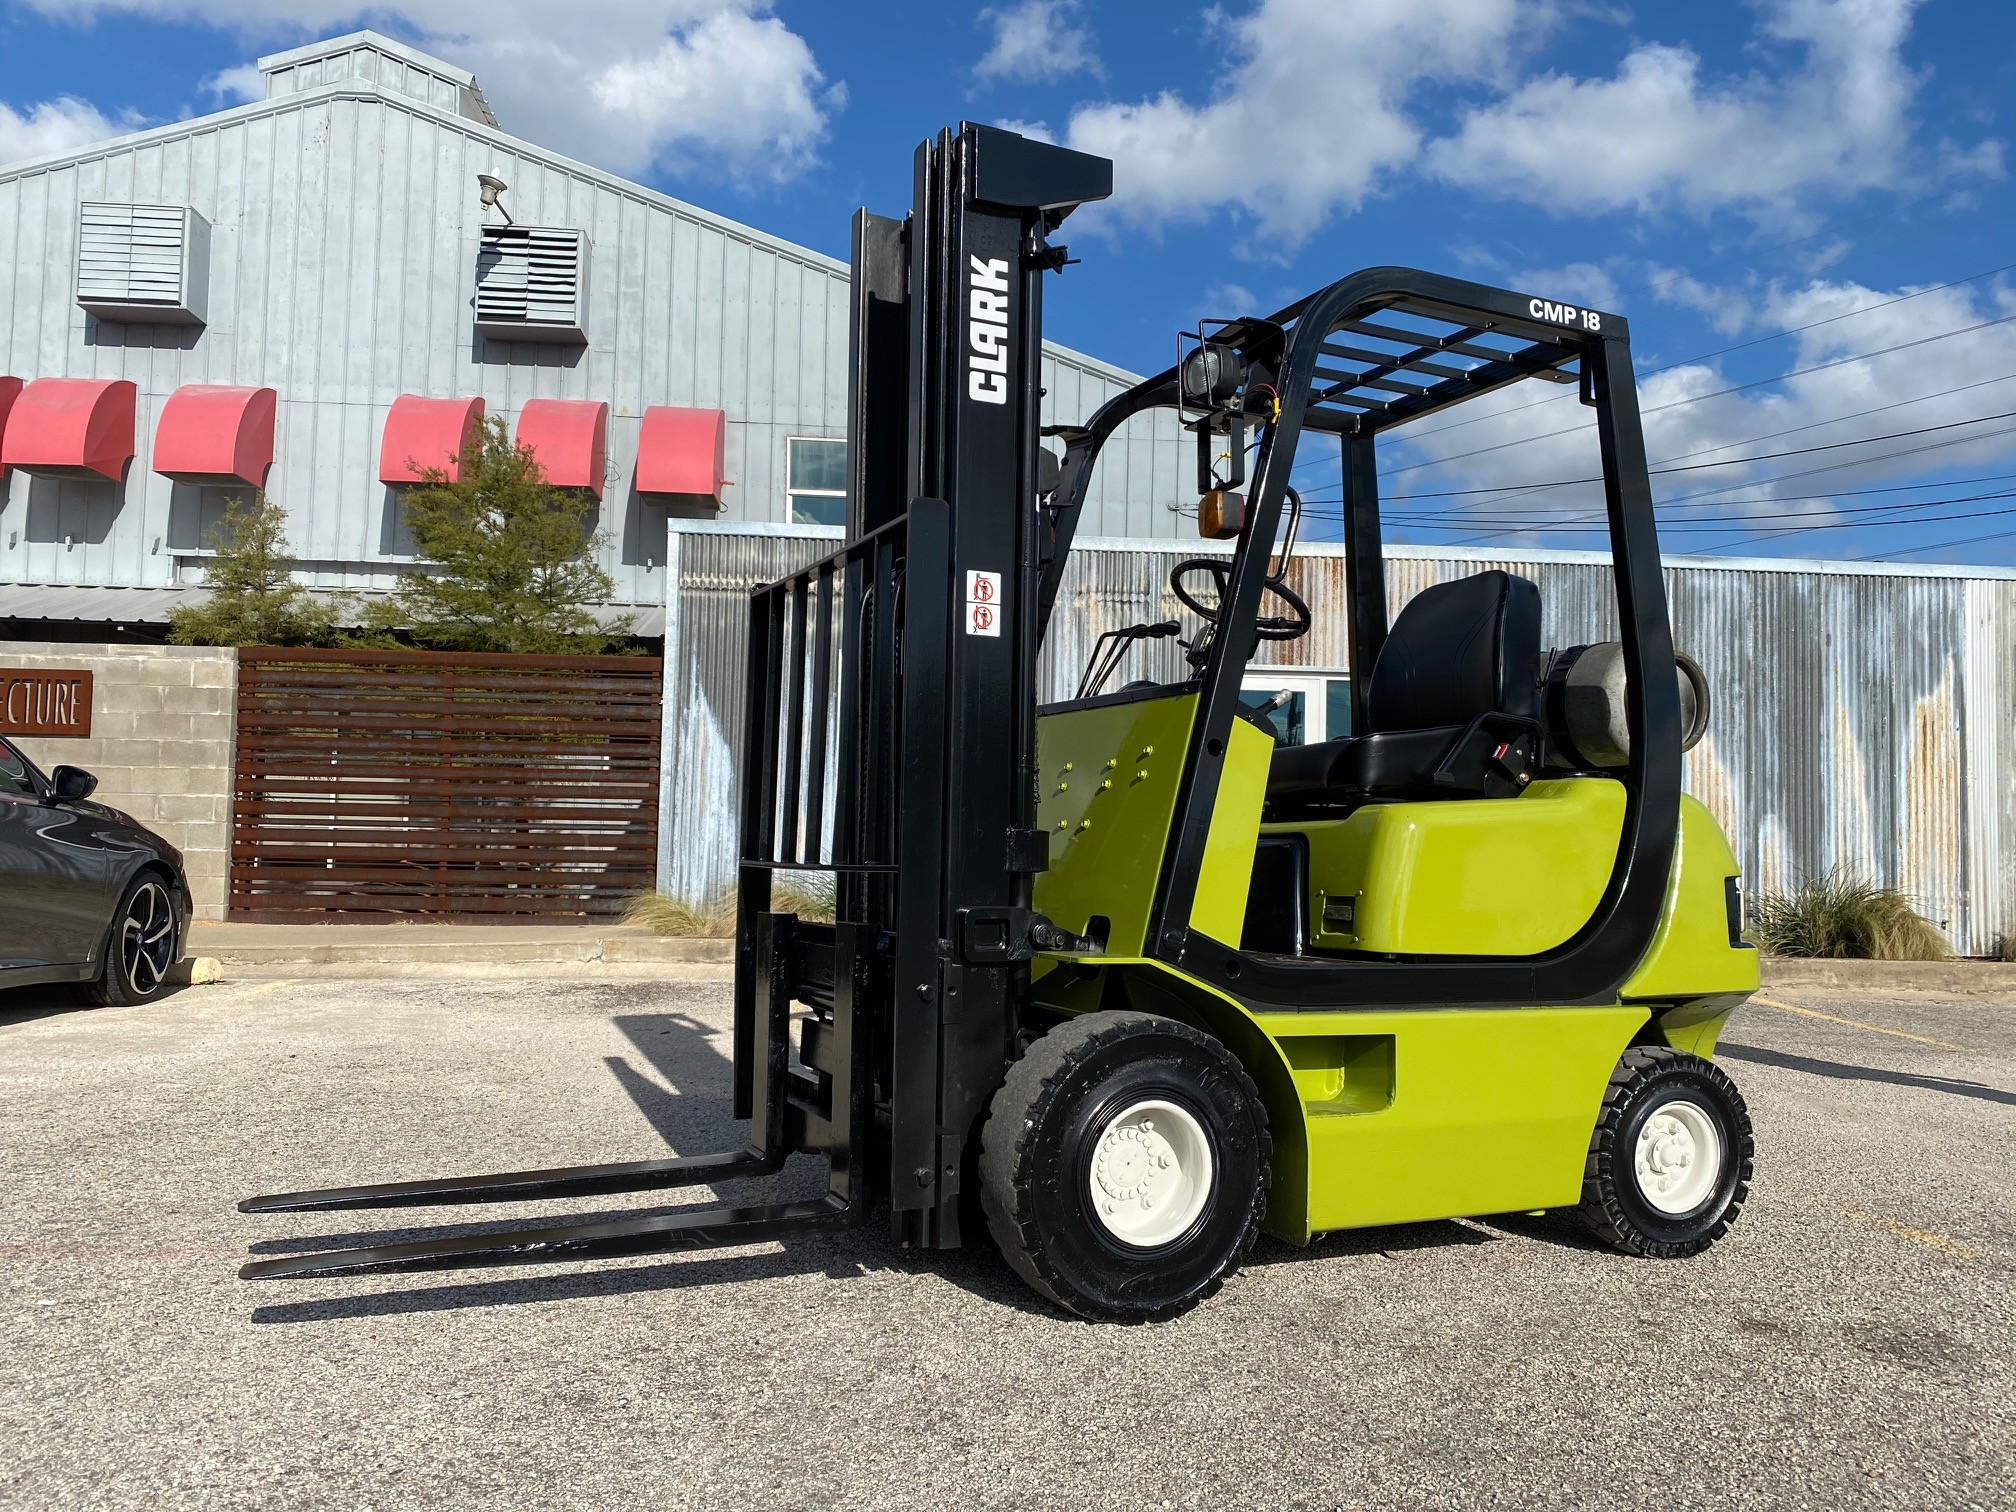 Used, 2004, CLARK, CMP18, Forklifts / Lift Trucks